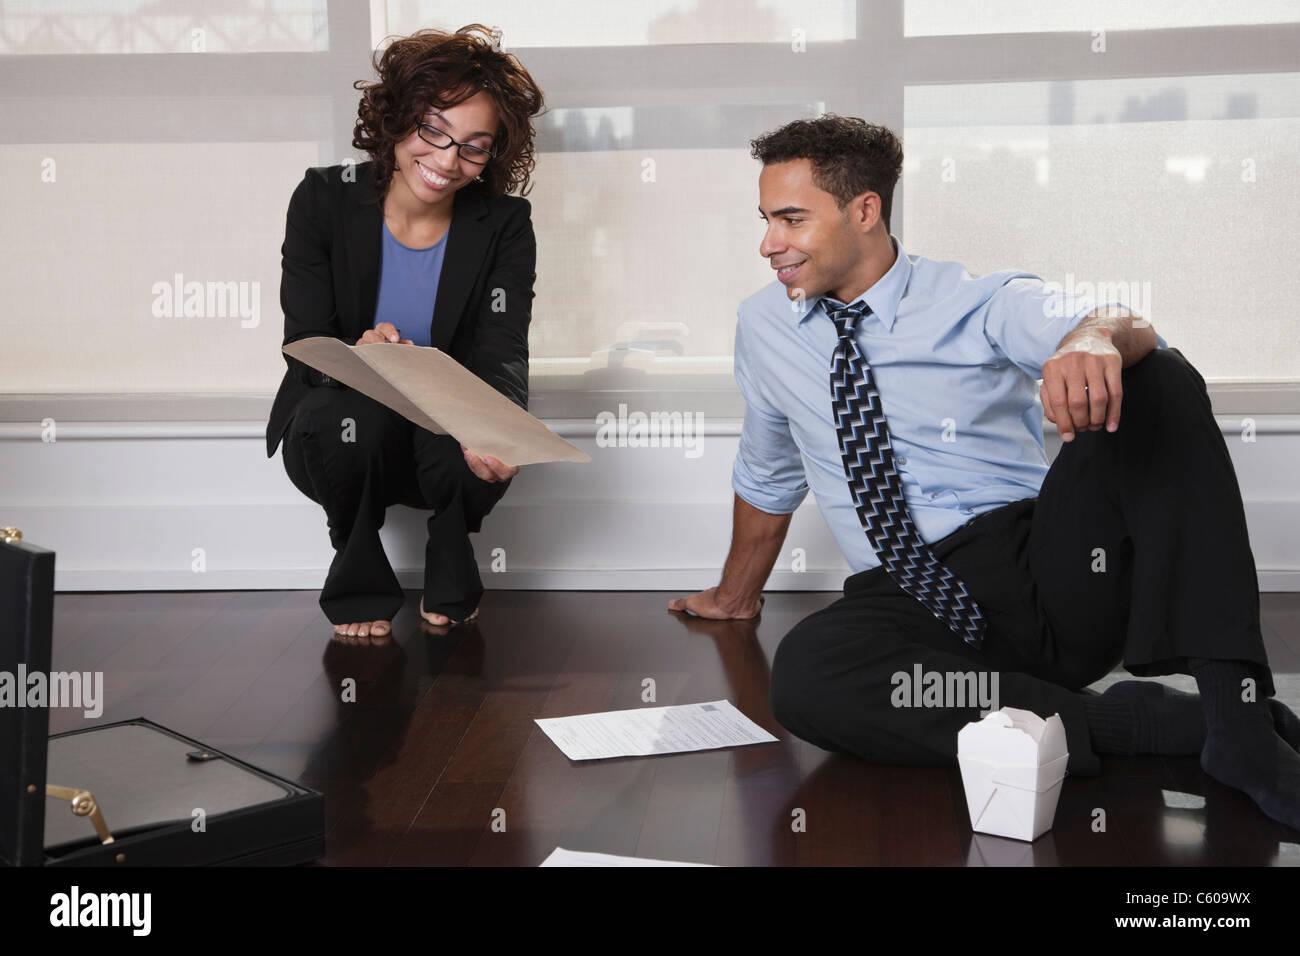 USA, New York, New York City, businesspeople having meeting in hotel room - Stock Image